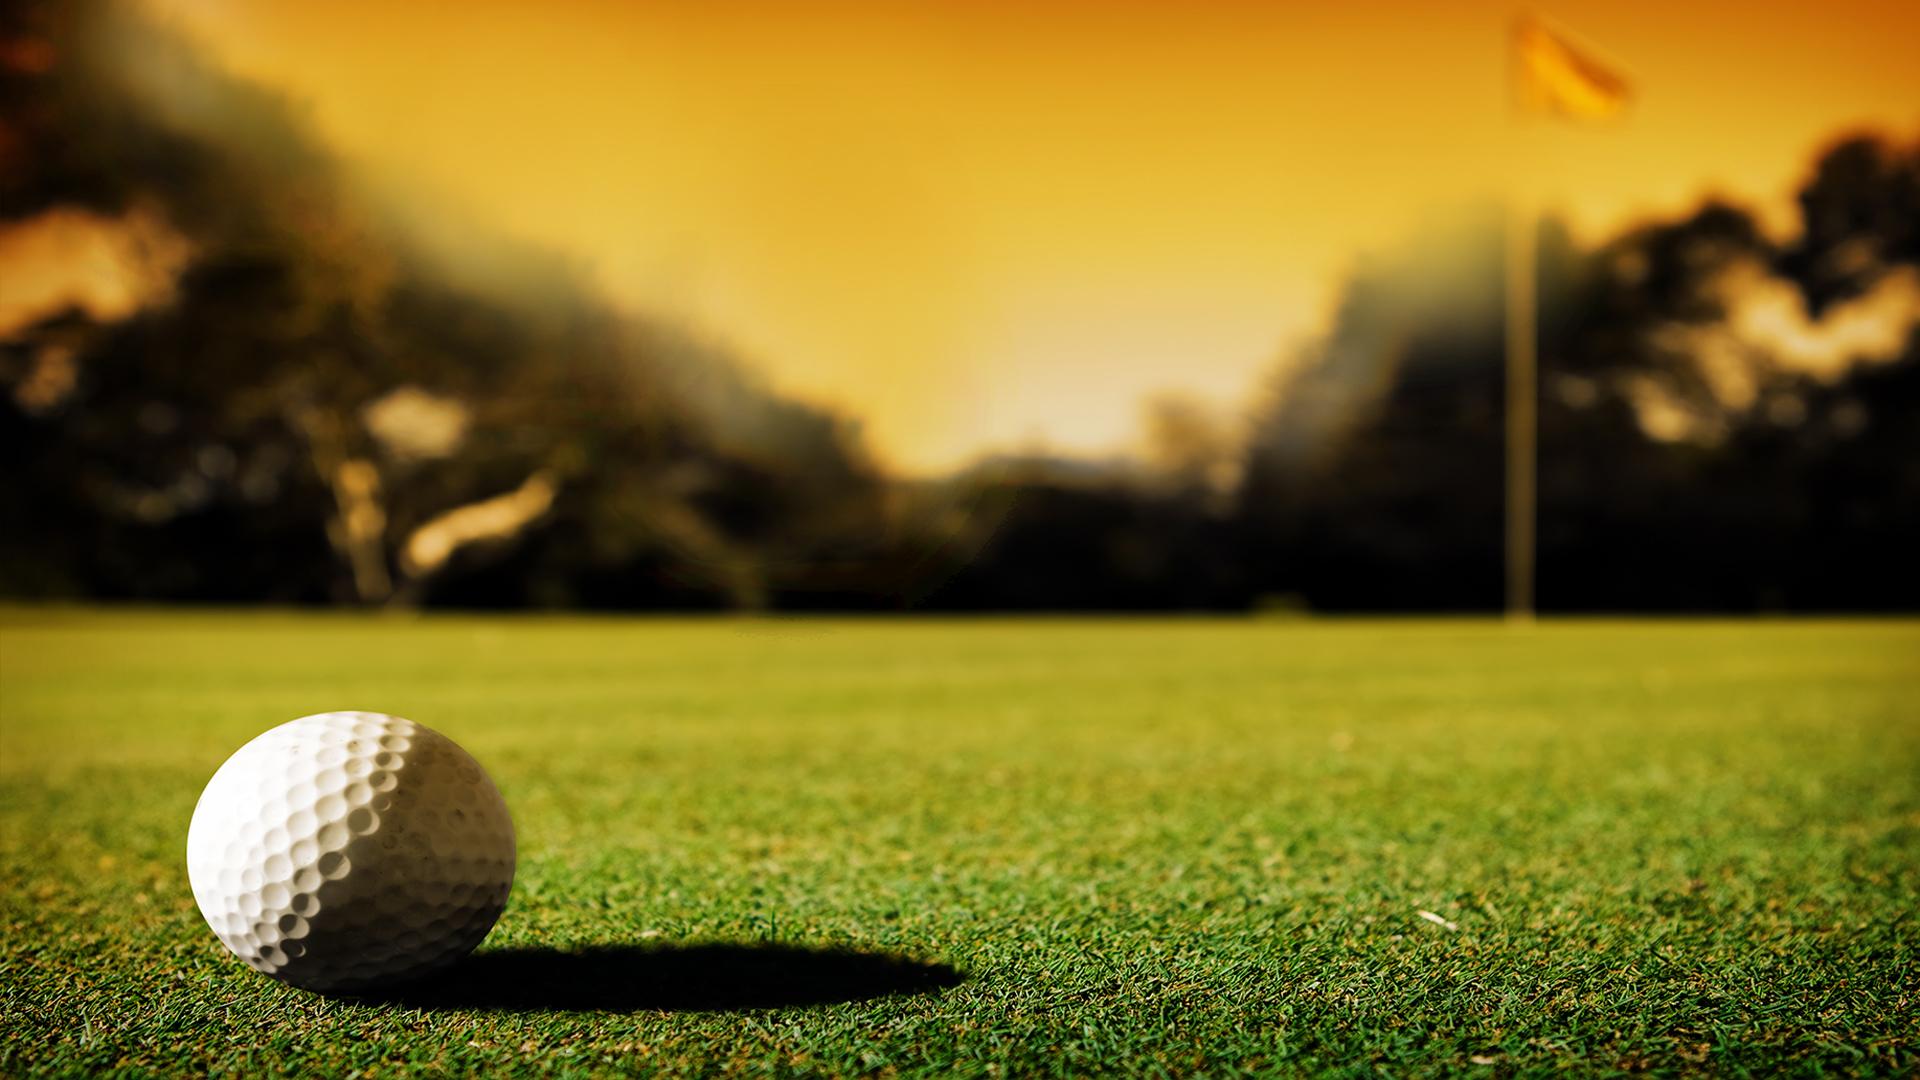 Wallpaper Stores In Sioux Falls Sd Wallpaper Golf Scenes Impremedia Net